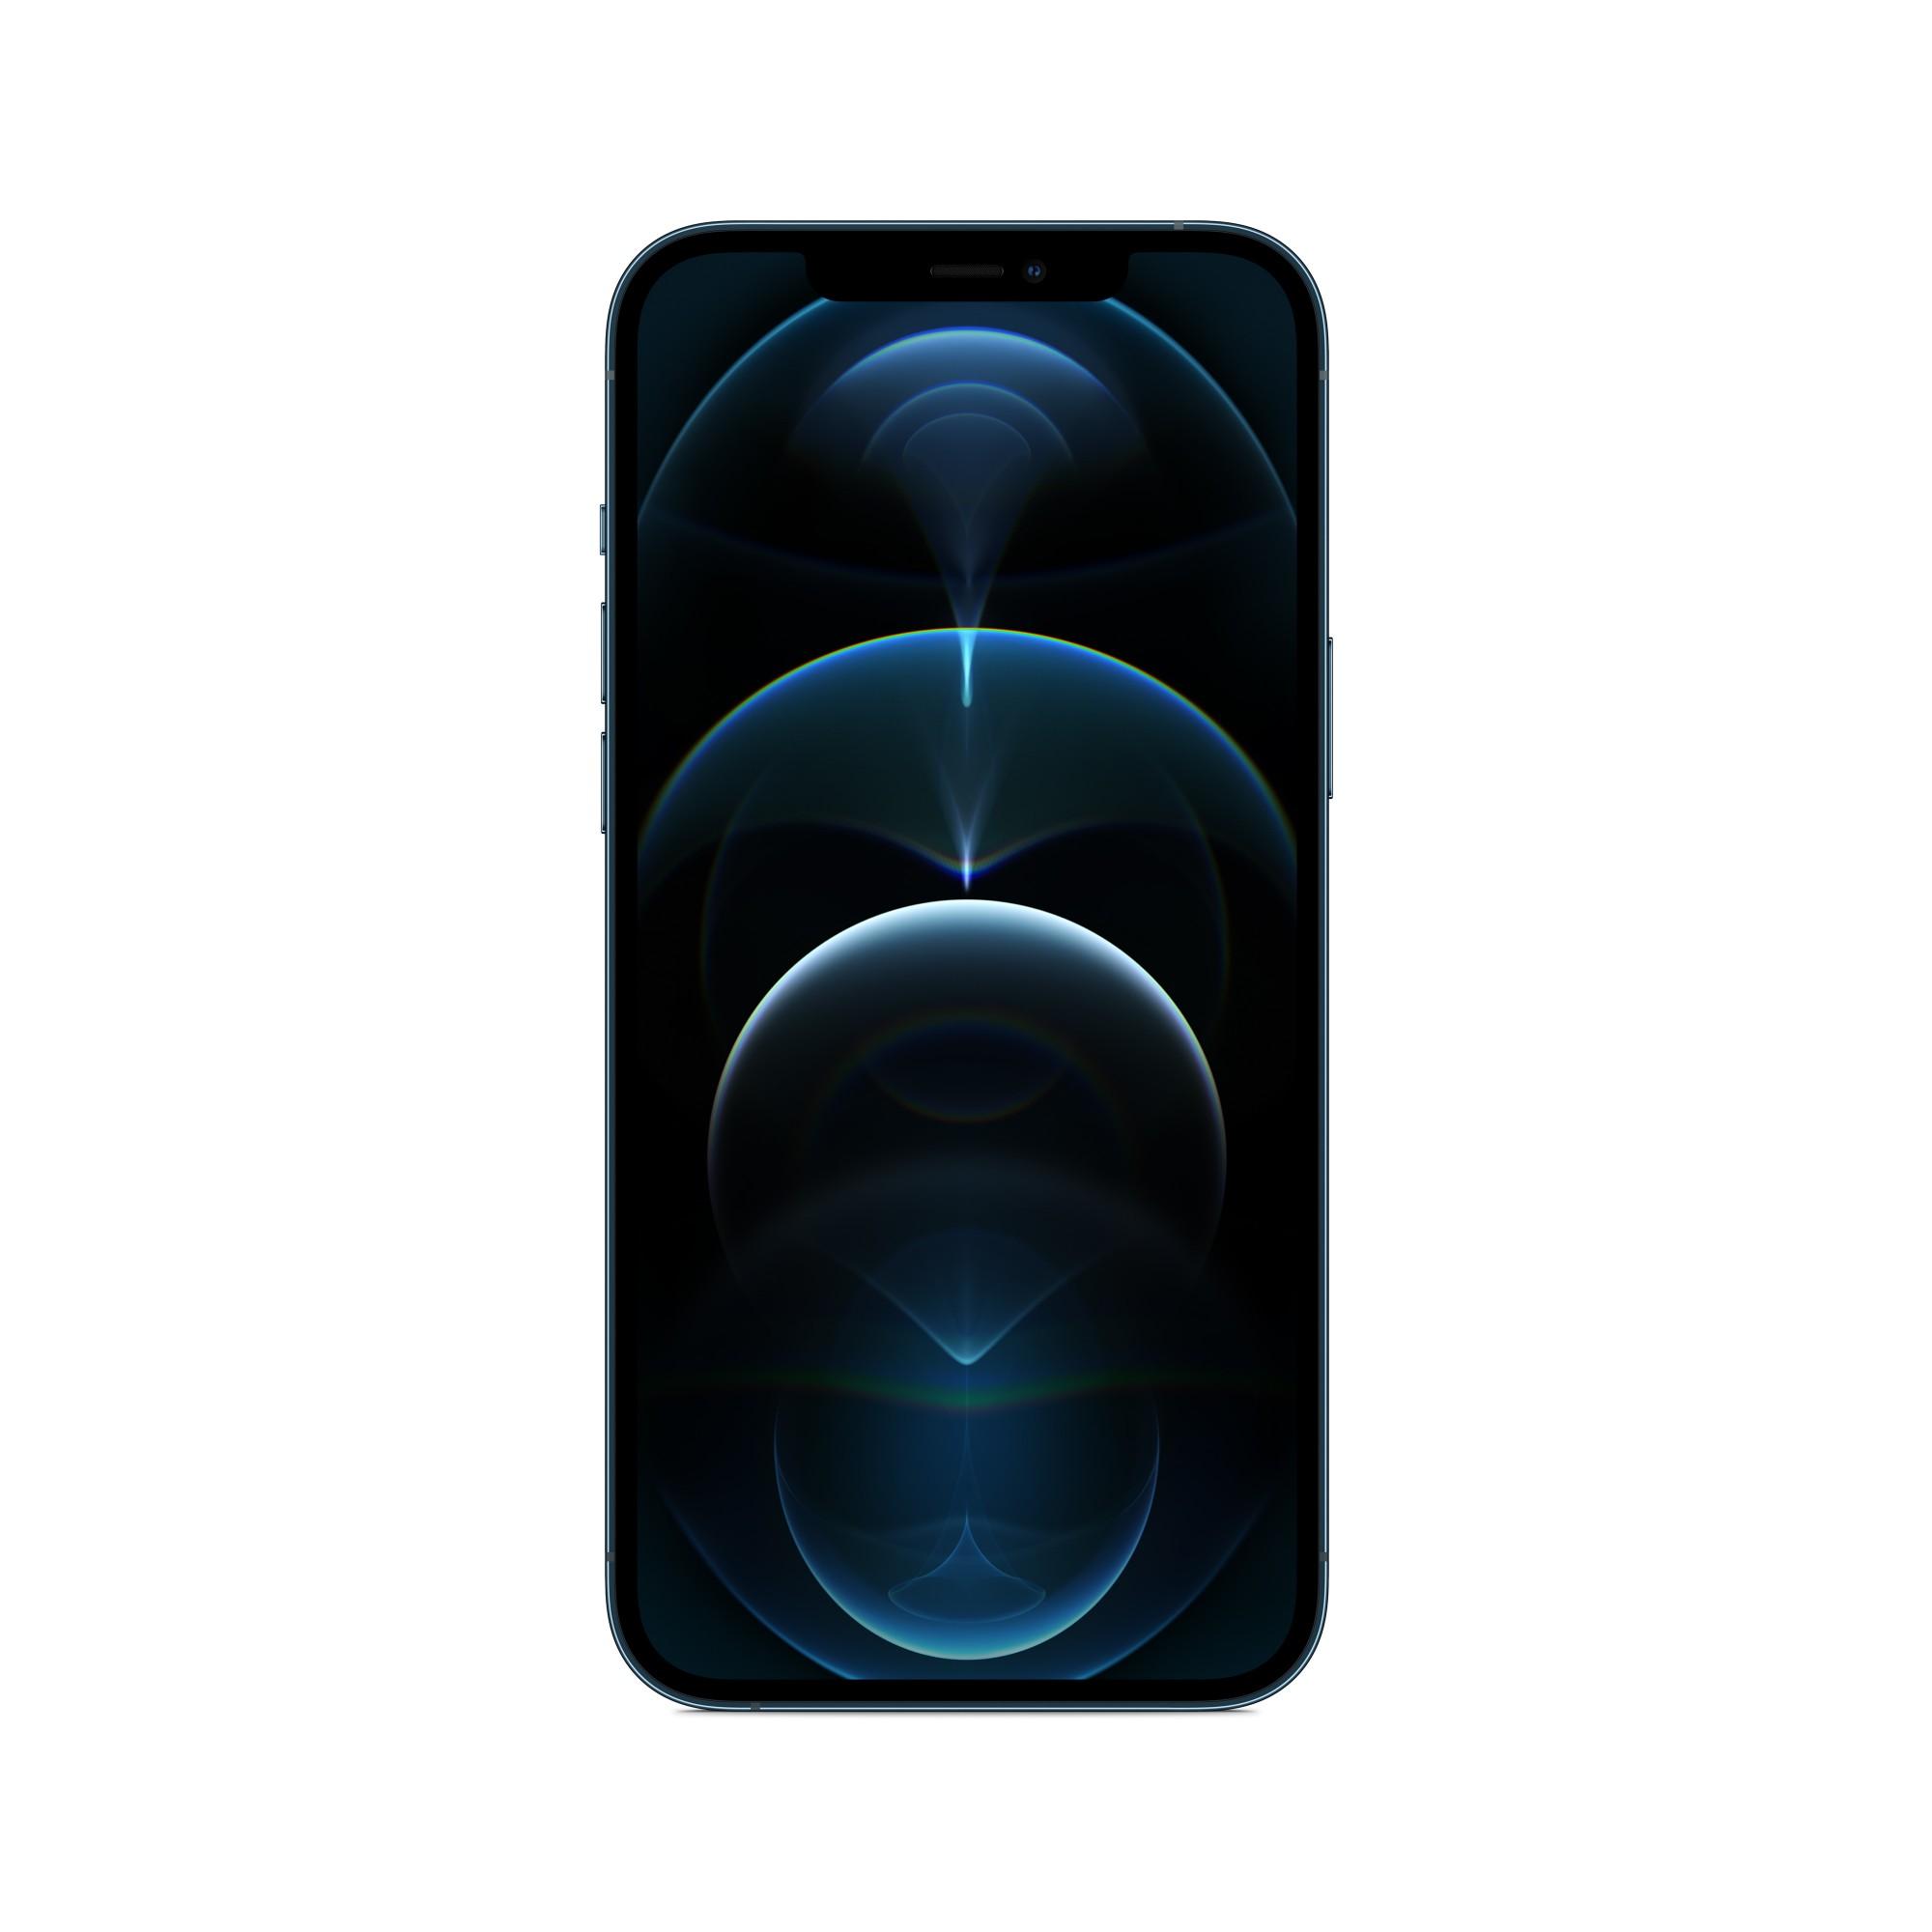 "Apple iPhone 12 Pro Max 17 cm (6.7"") 128 GB SIM doble 5G Azul iOS 14"